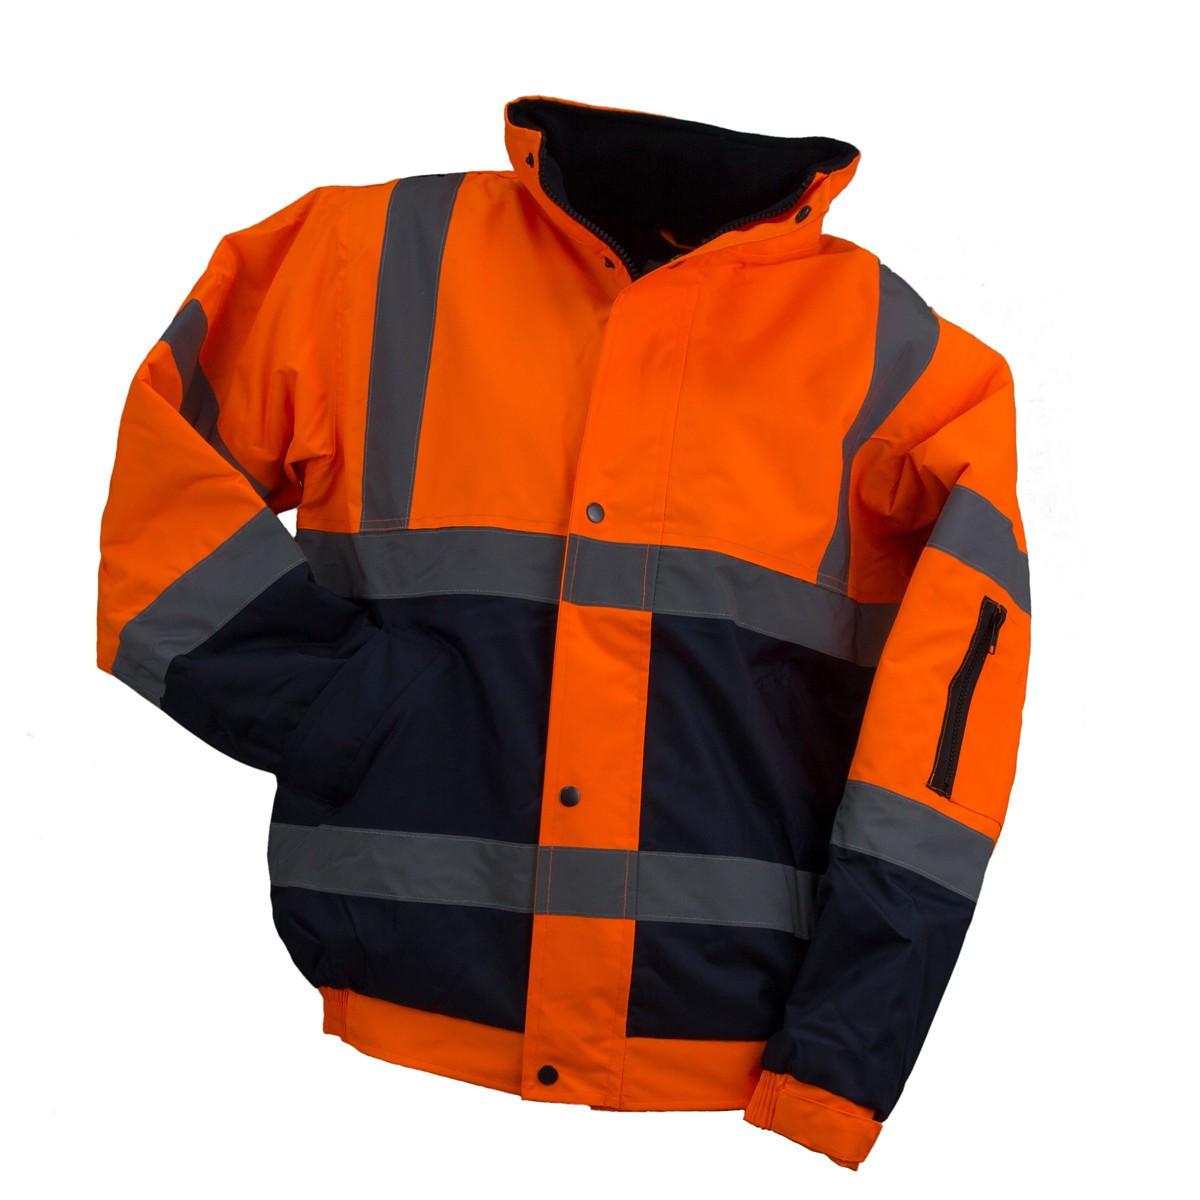 Куртка  BOMBER ORANGE со светотражающими полосами, черно-оранжевого цвета. Urgent (POLAND)